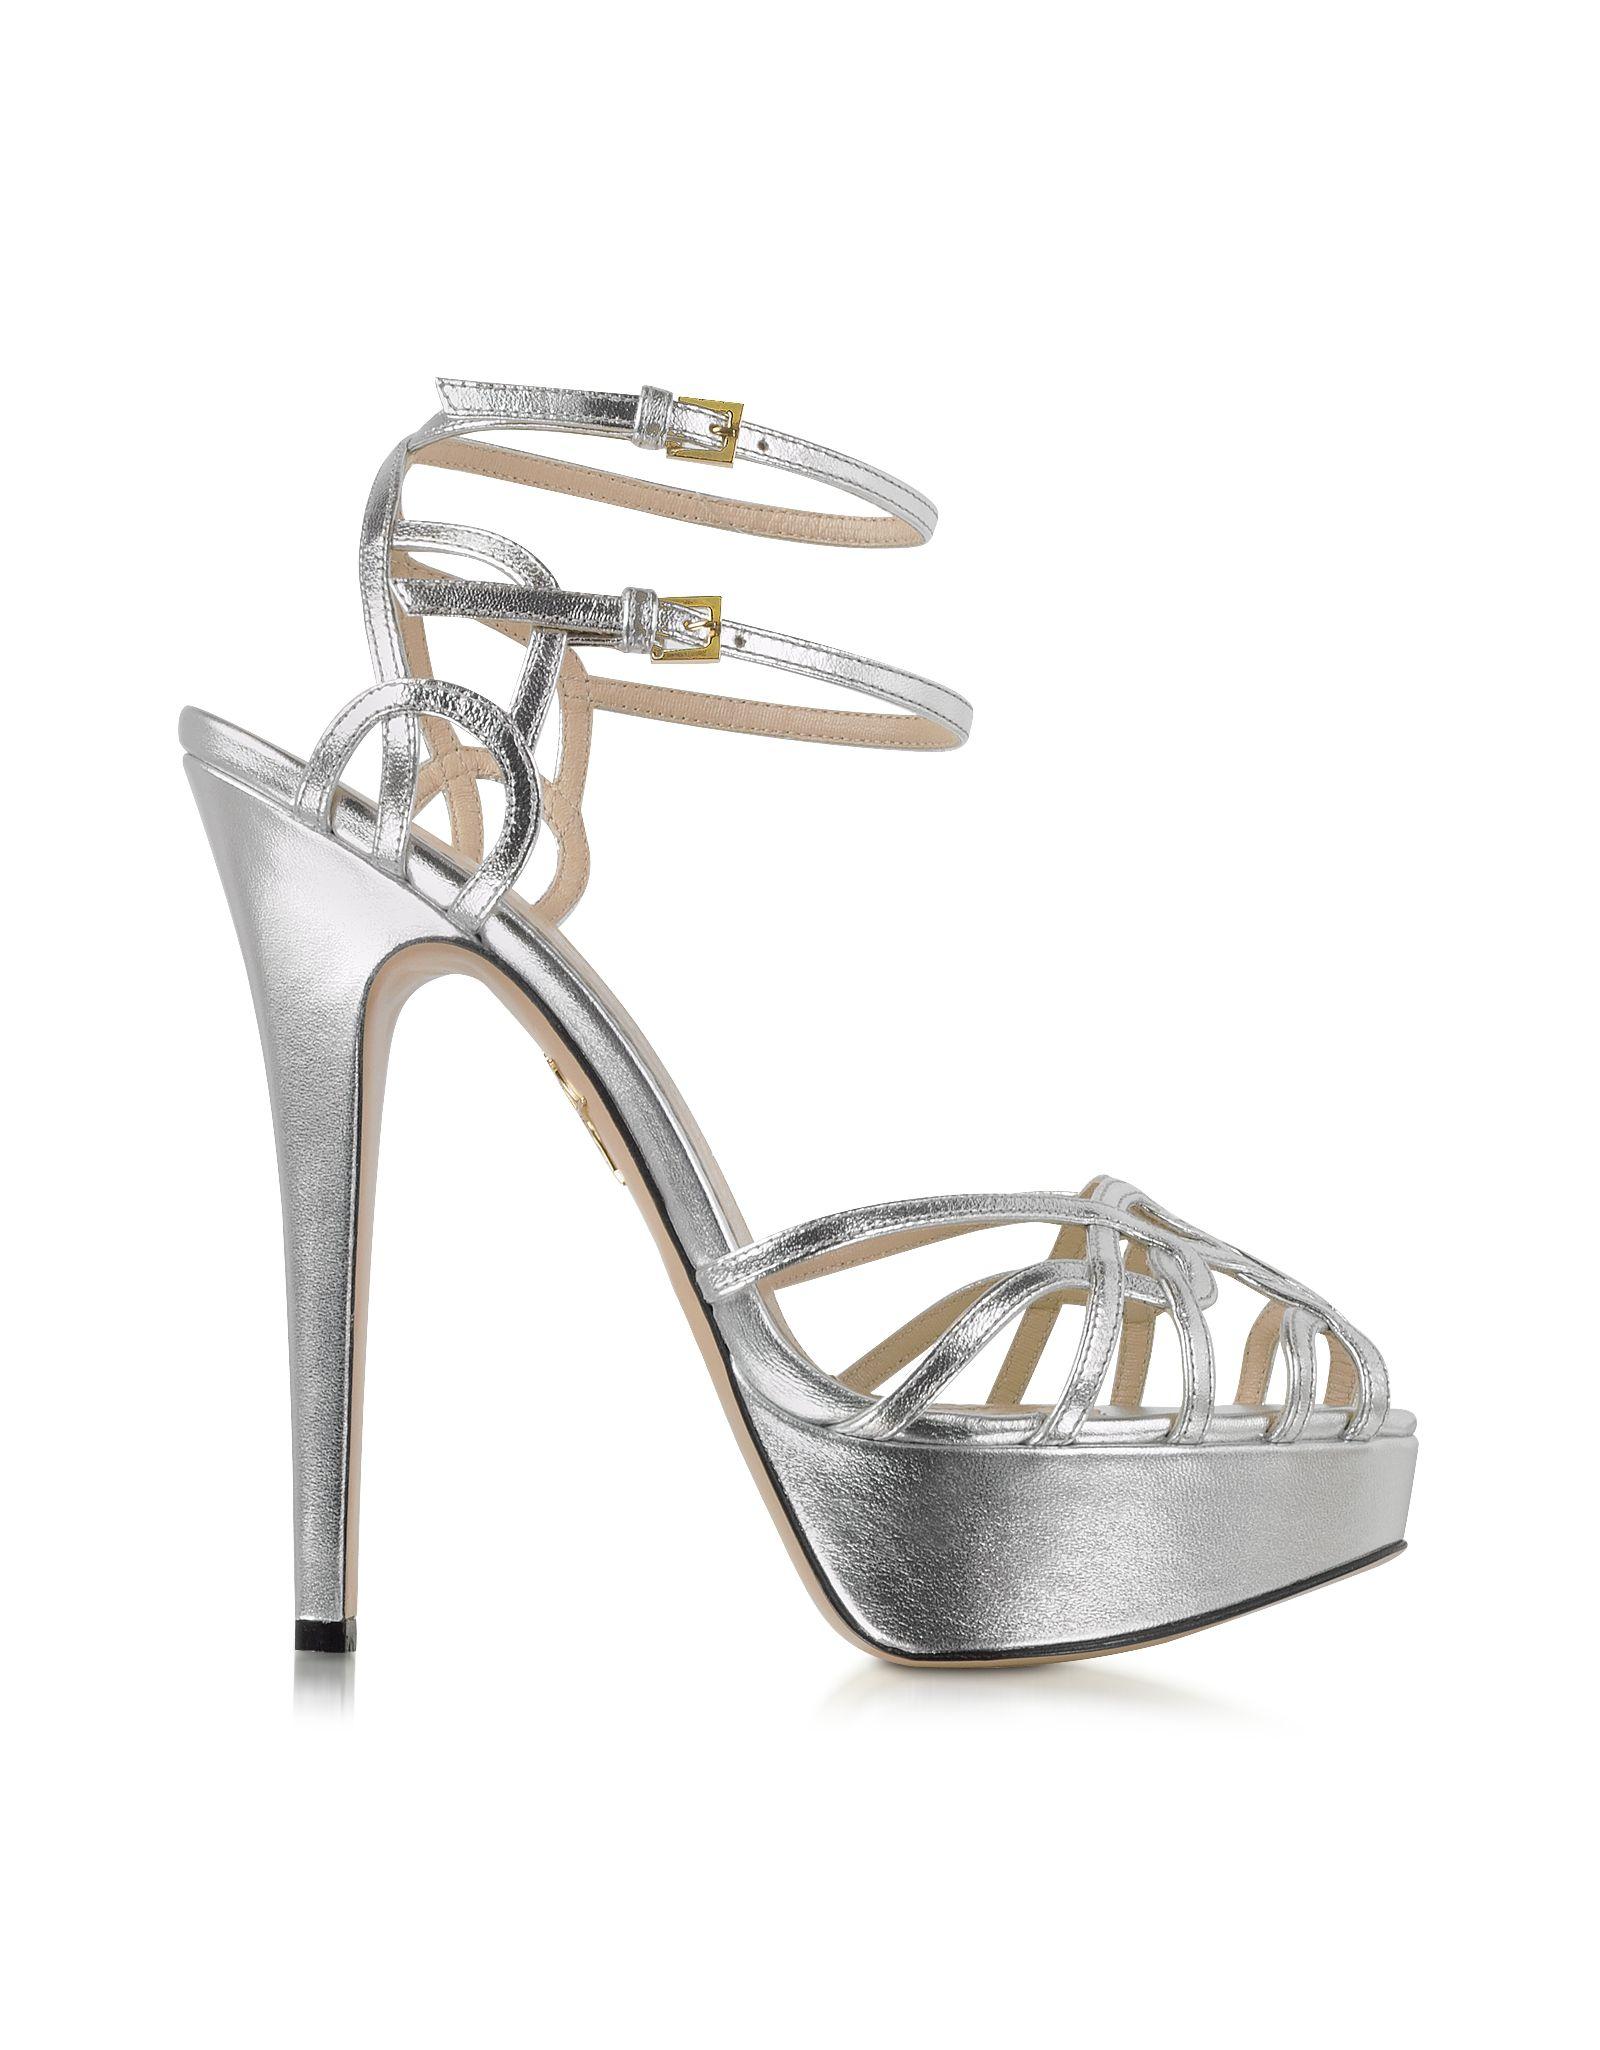 Charlotte Olympia Ursula Silver Metallic Platform Sandal 37 (7 US | 4 UK | 37 EU) at FORZIERI